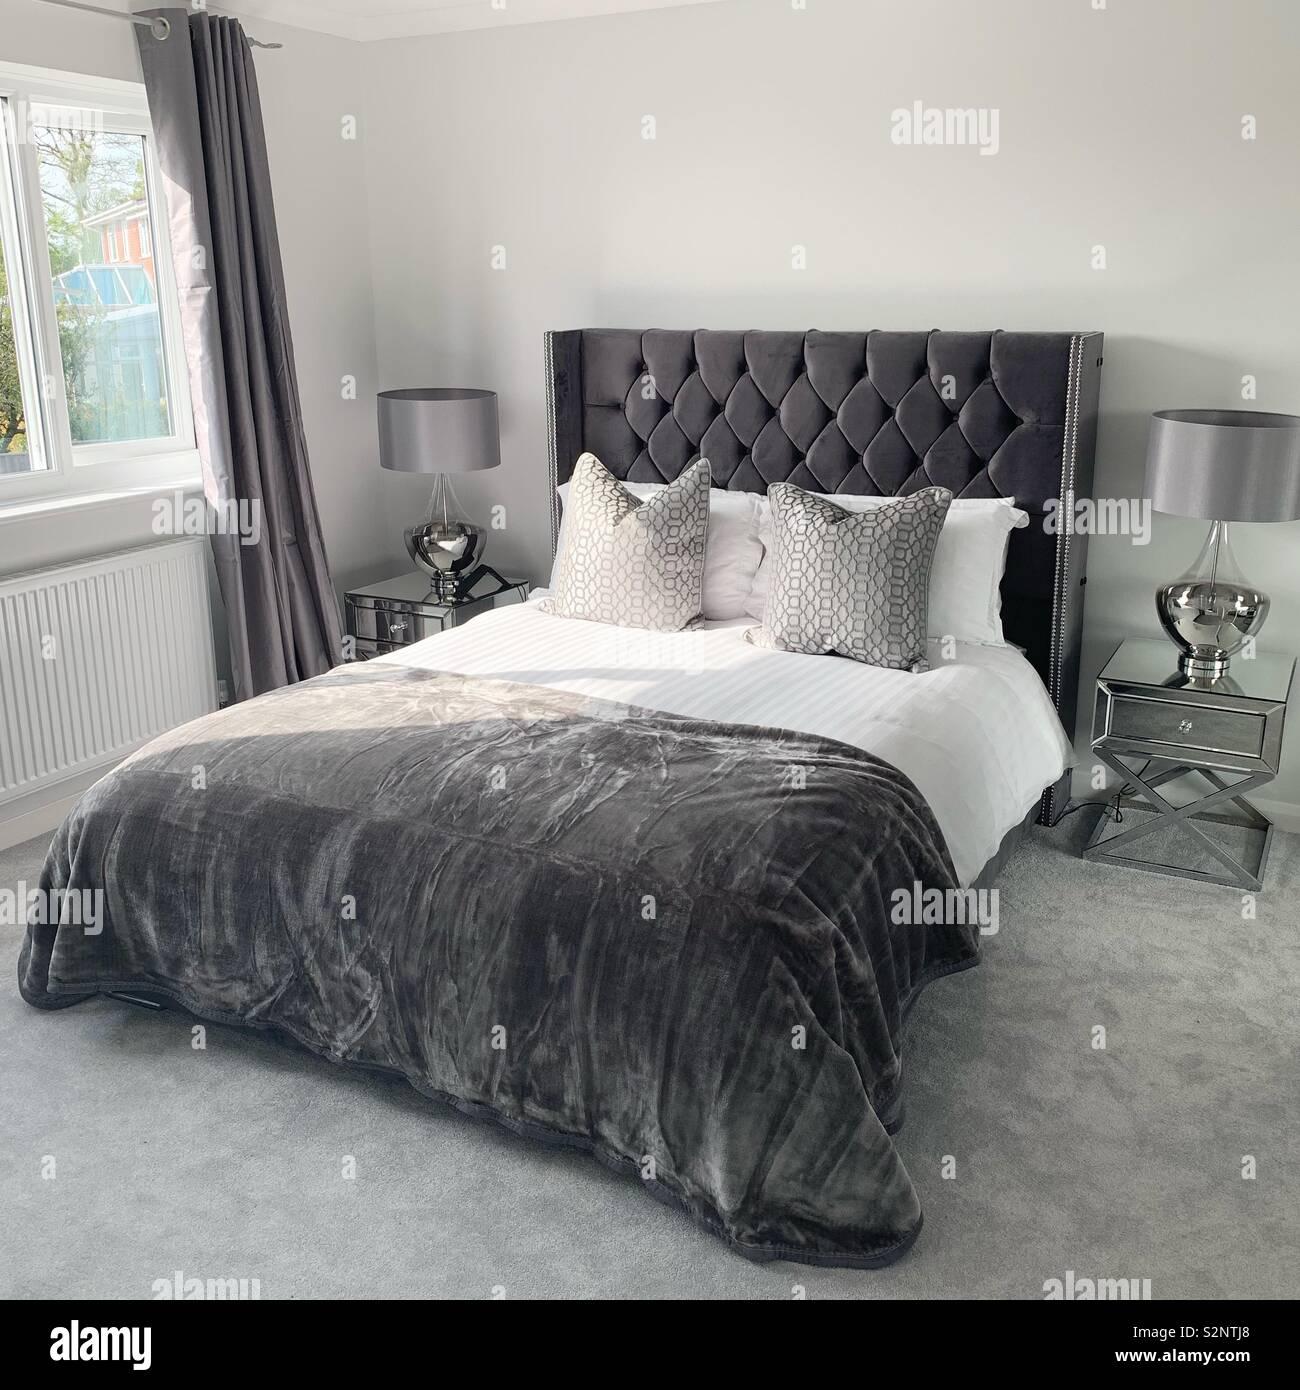 Gorgeous Dark Grey Velvet King Size Bed Stock Photo Alamy